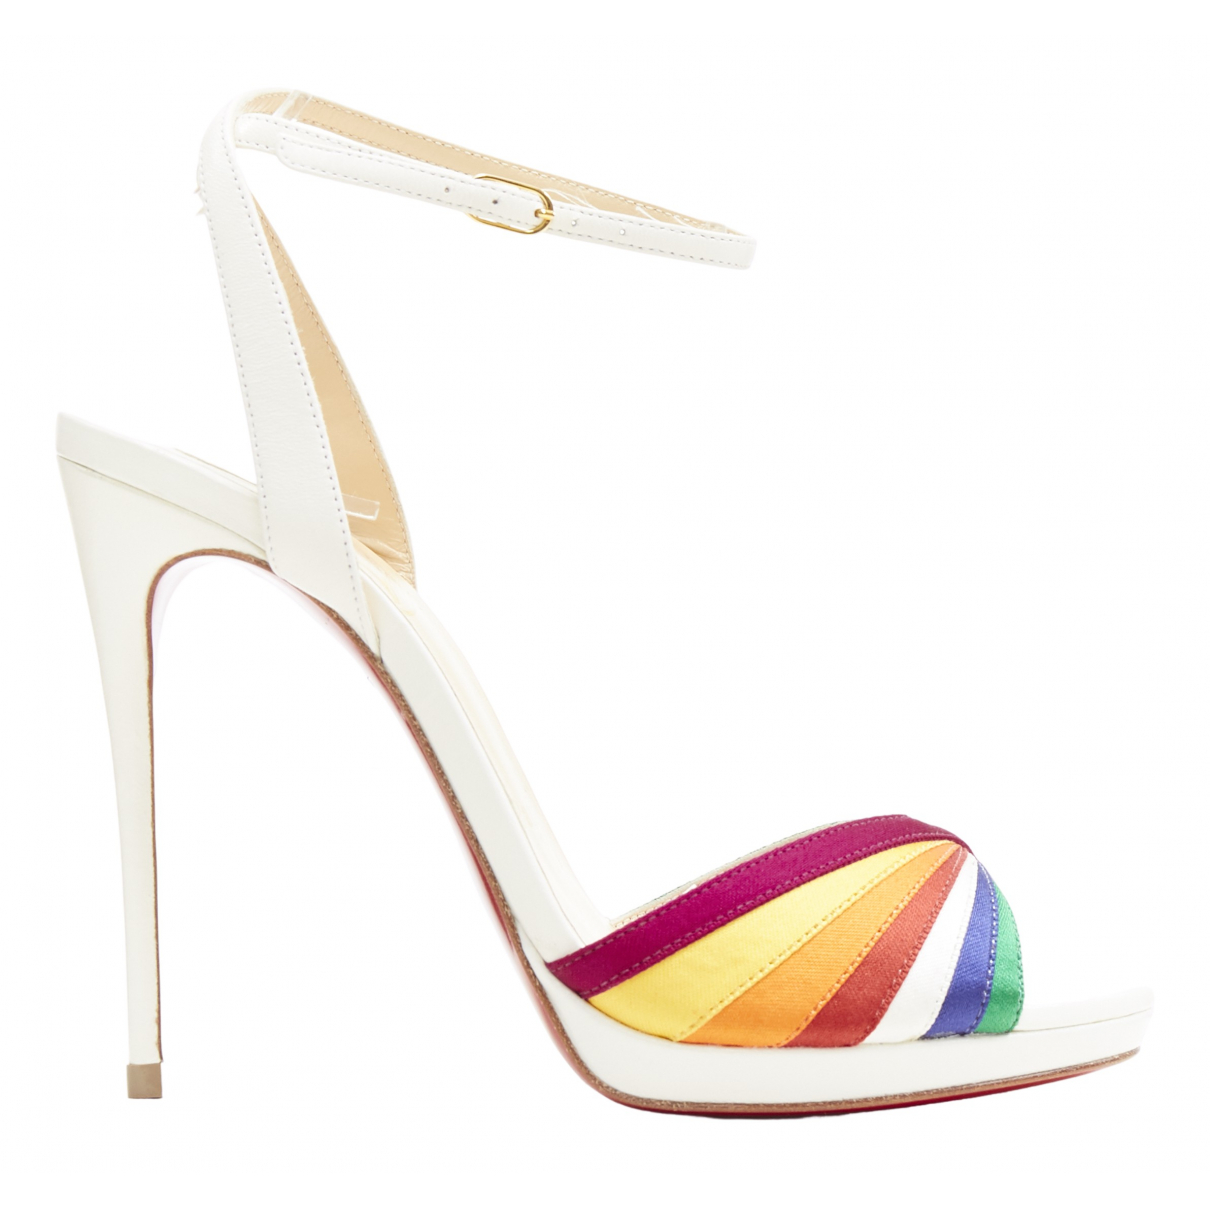 Christian Louboutin \N White Leather Sandals for Women 35.5 EU